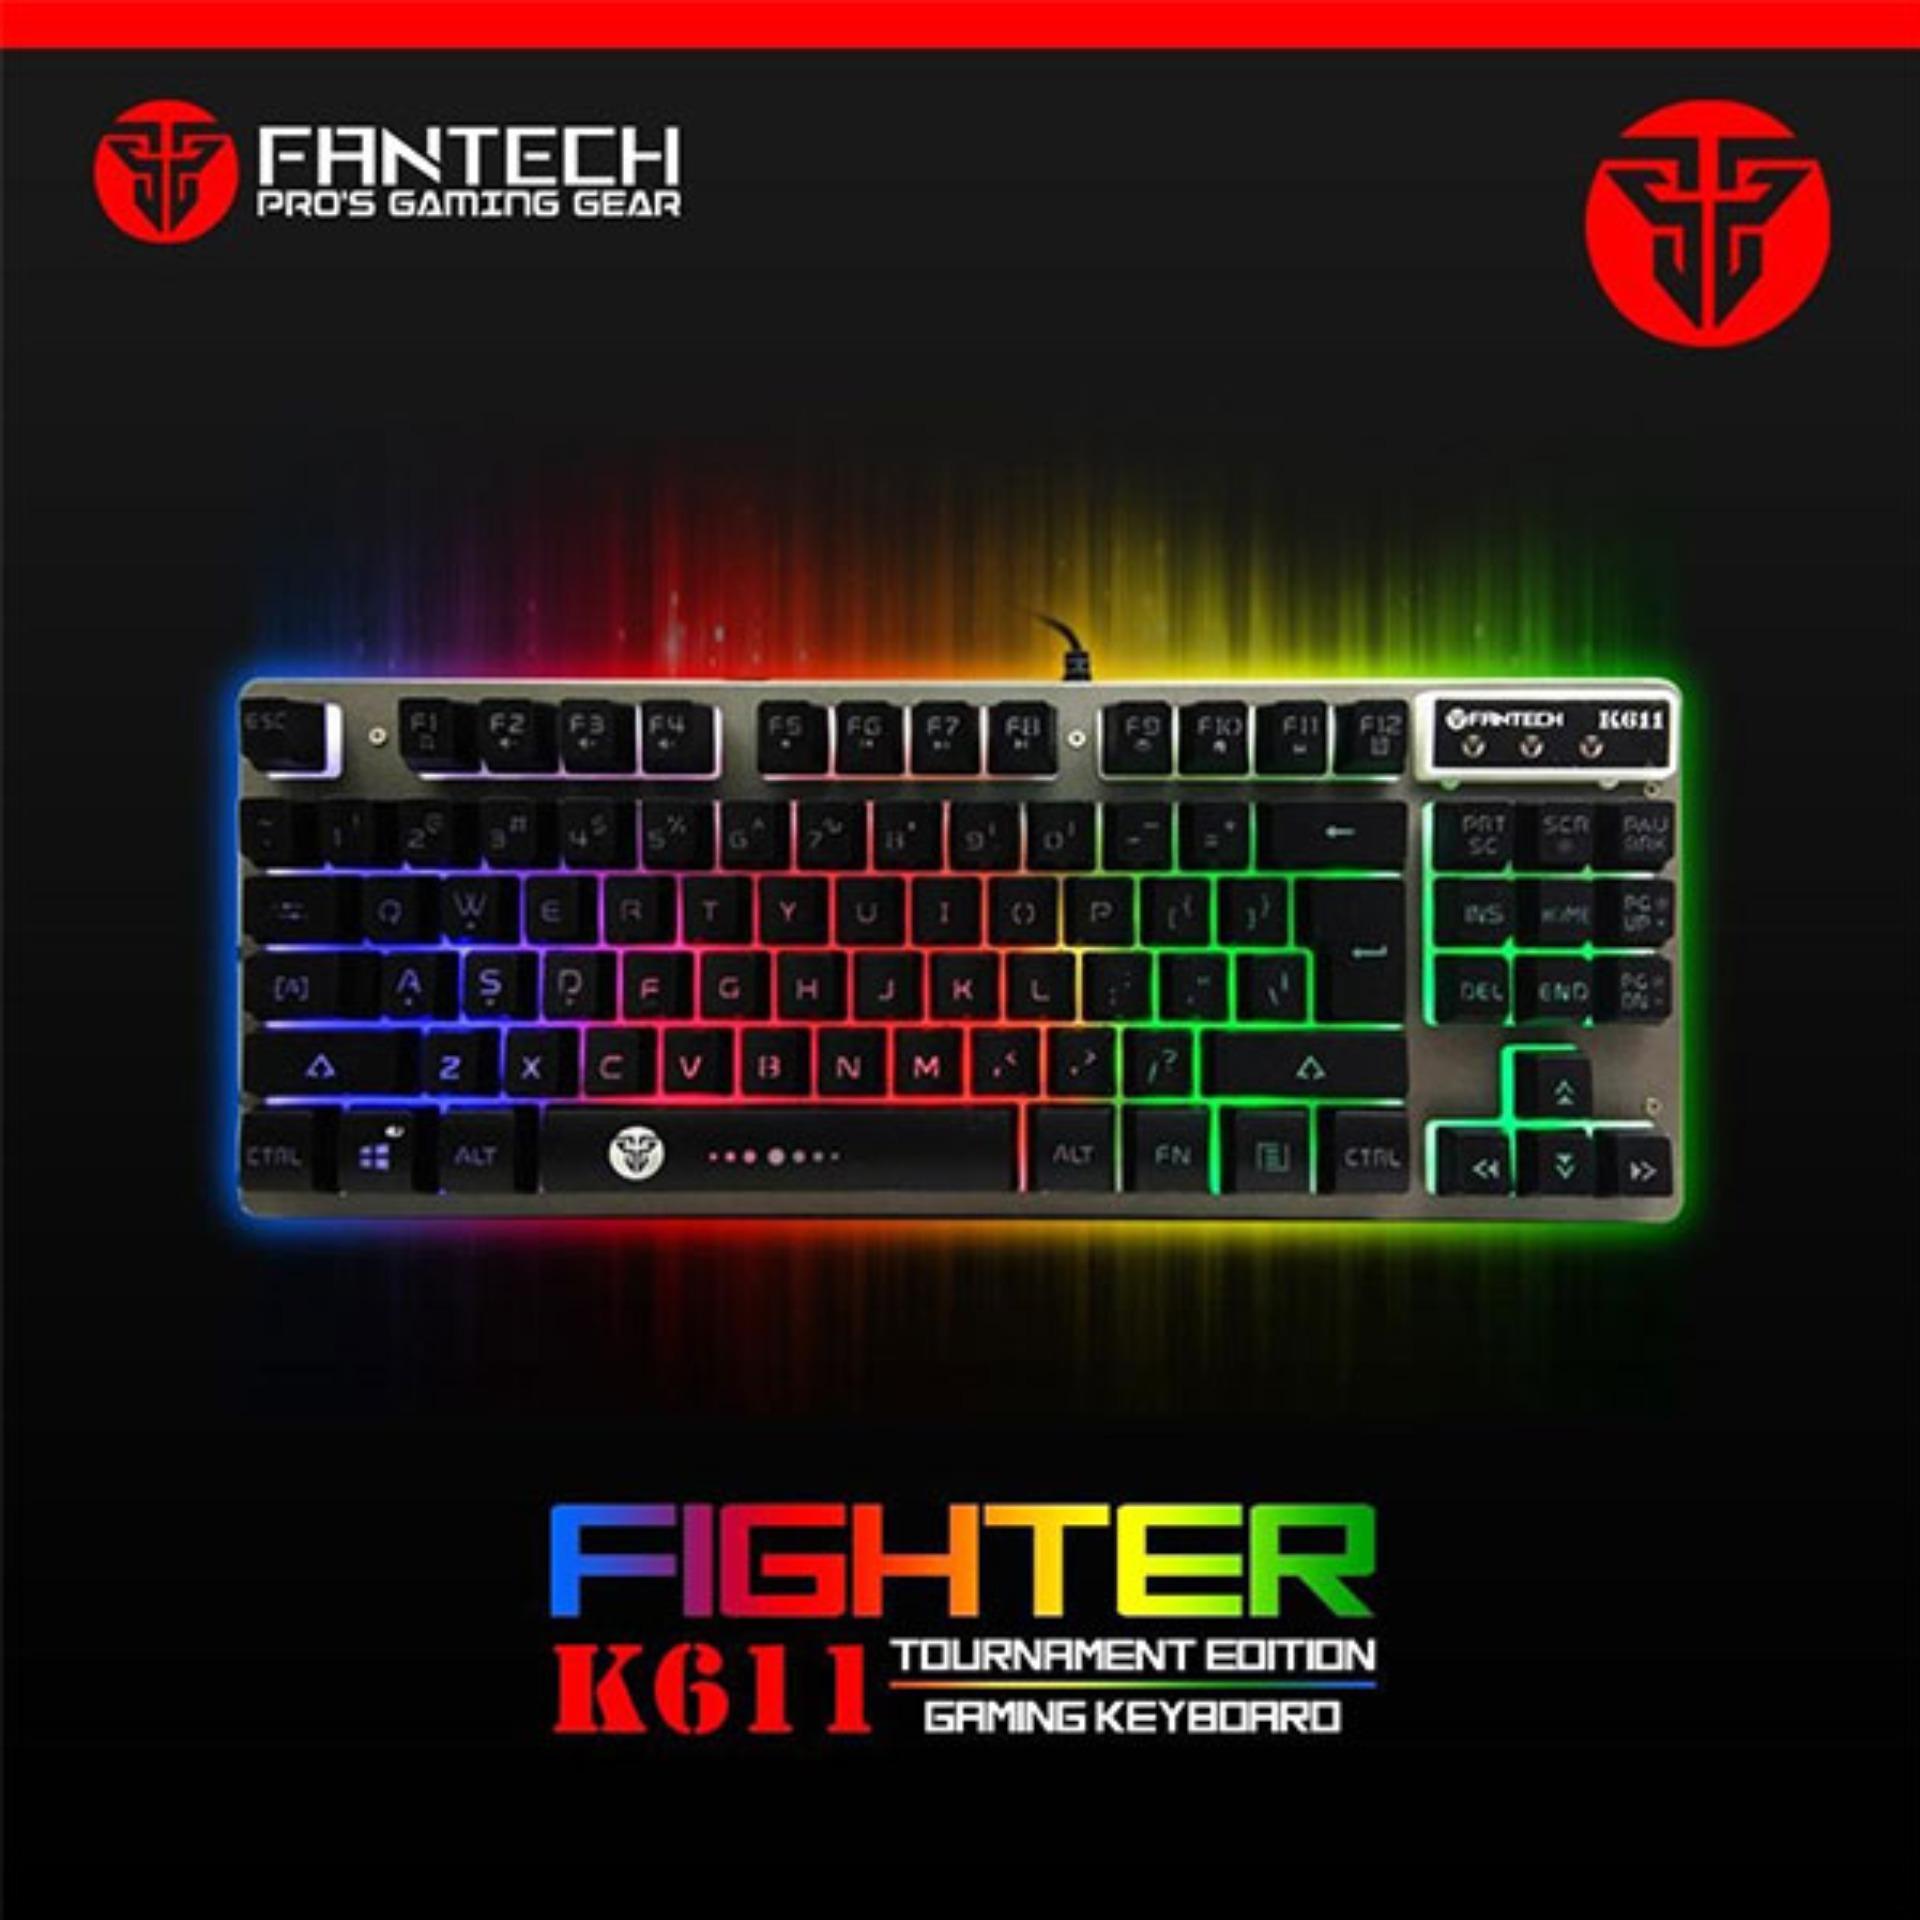 e16f0153600 FanTech Fighter K611 Keyboard Backlit Floating-Keys Multimedia Gaming  Keyboard with Chroma Backlighting Tournament Edition